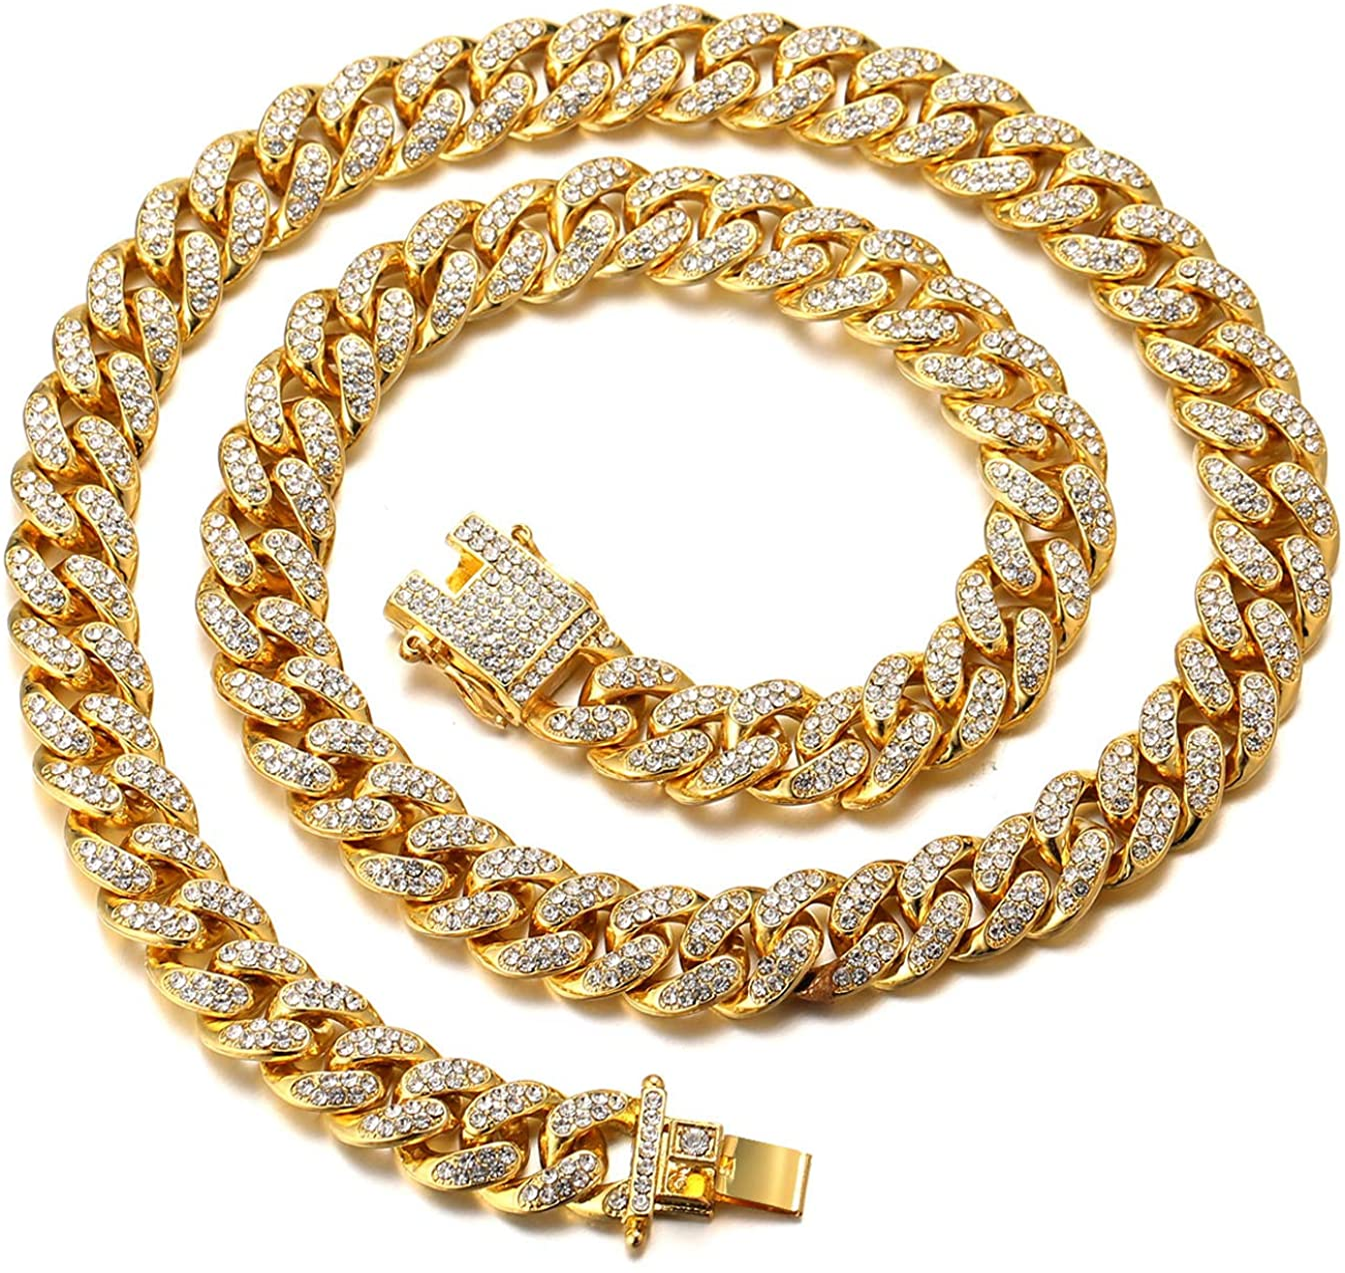 Halukakah Cadenas de Oro Hombre,18k Oro Verdadero/Blanco Oro Plateado 14mm Gargantillas Collares Pulseras,Iced out con Diamantes,Oro/Plata,Miami Cadena Cubana,con Caja